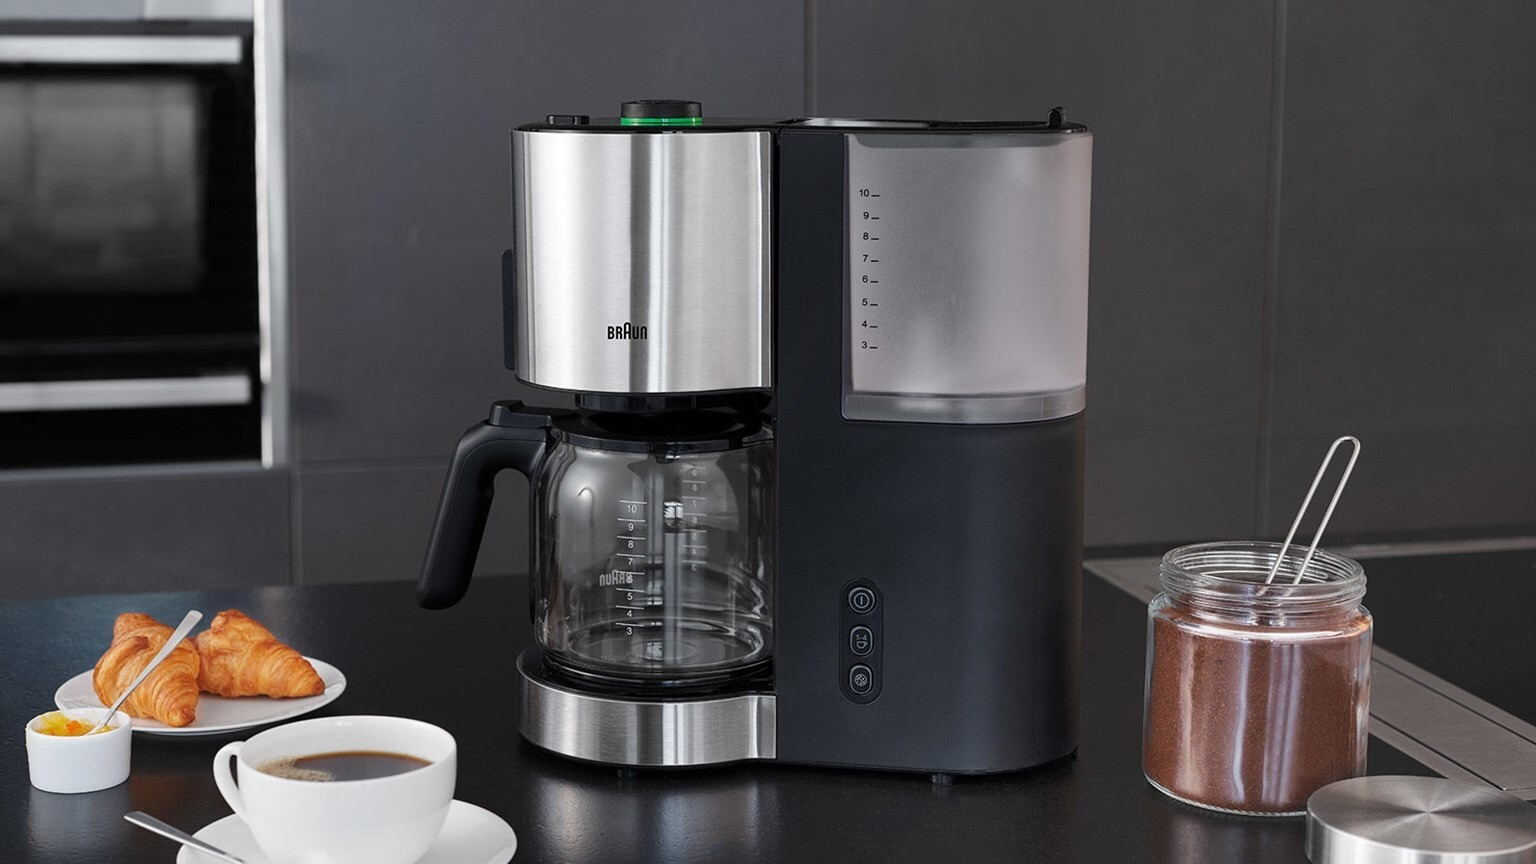 Braun KF5120 BK koffiefilter apparaat